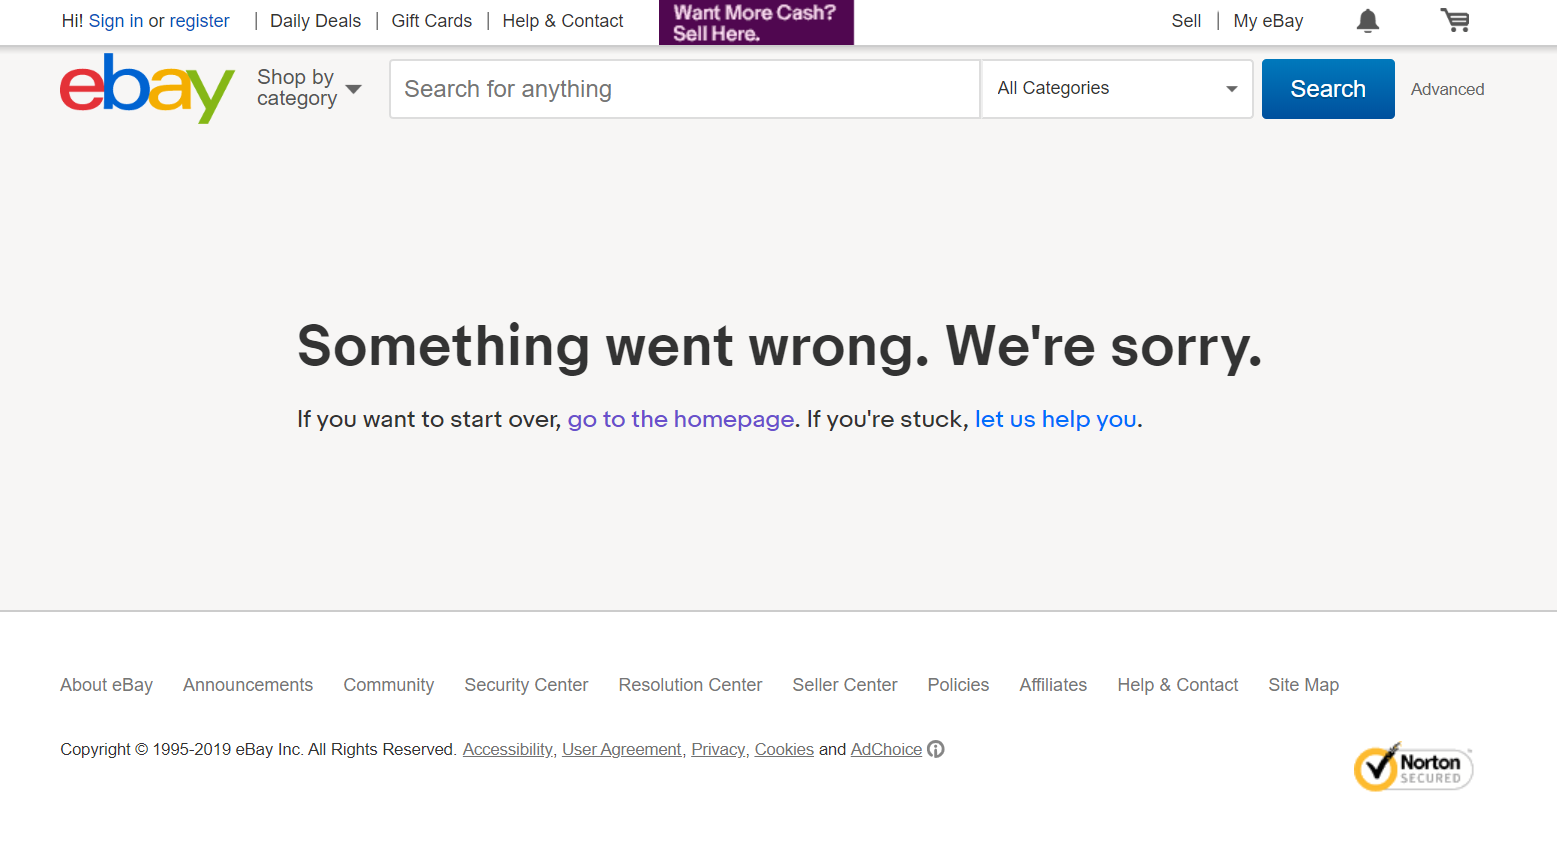 poor website performance hampers customer experience